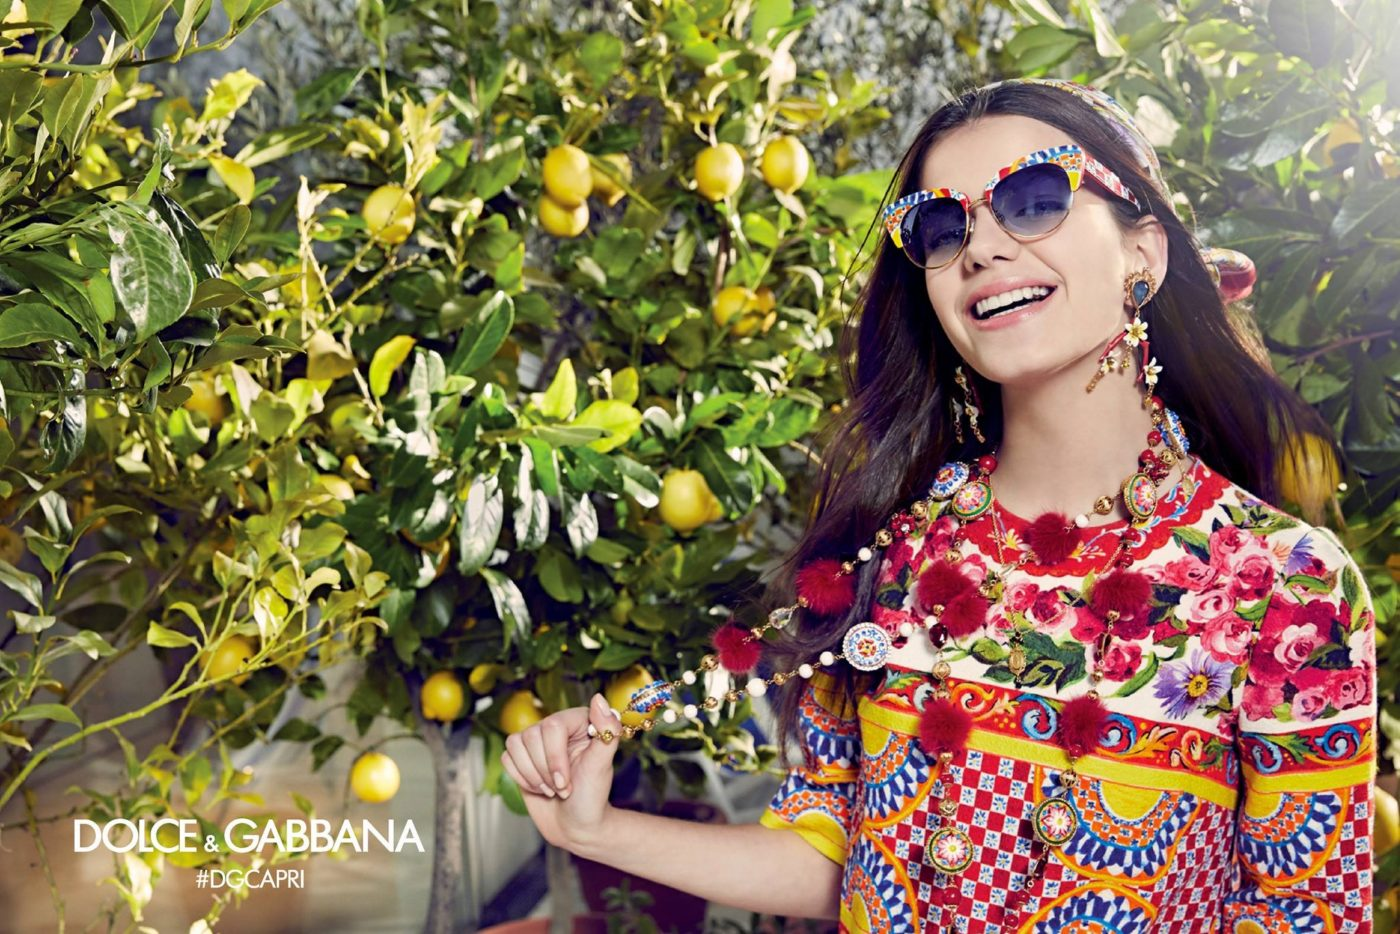 Dolce & Gabbana Spring 2017 Eyewear Campaign | LES FAÇONS